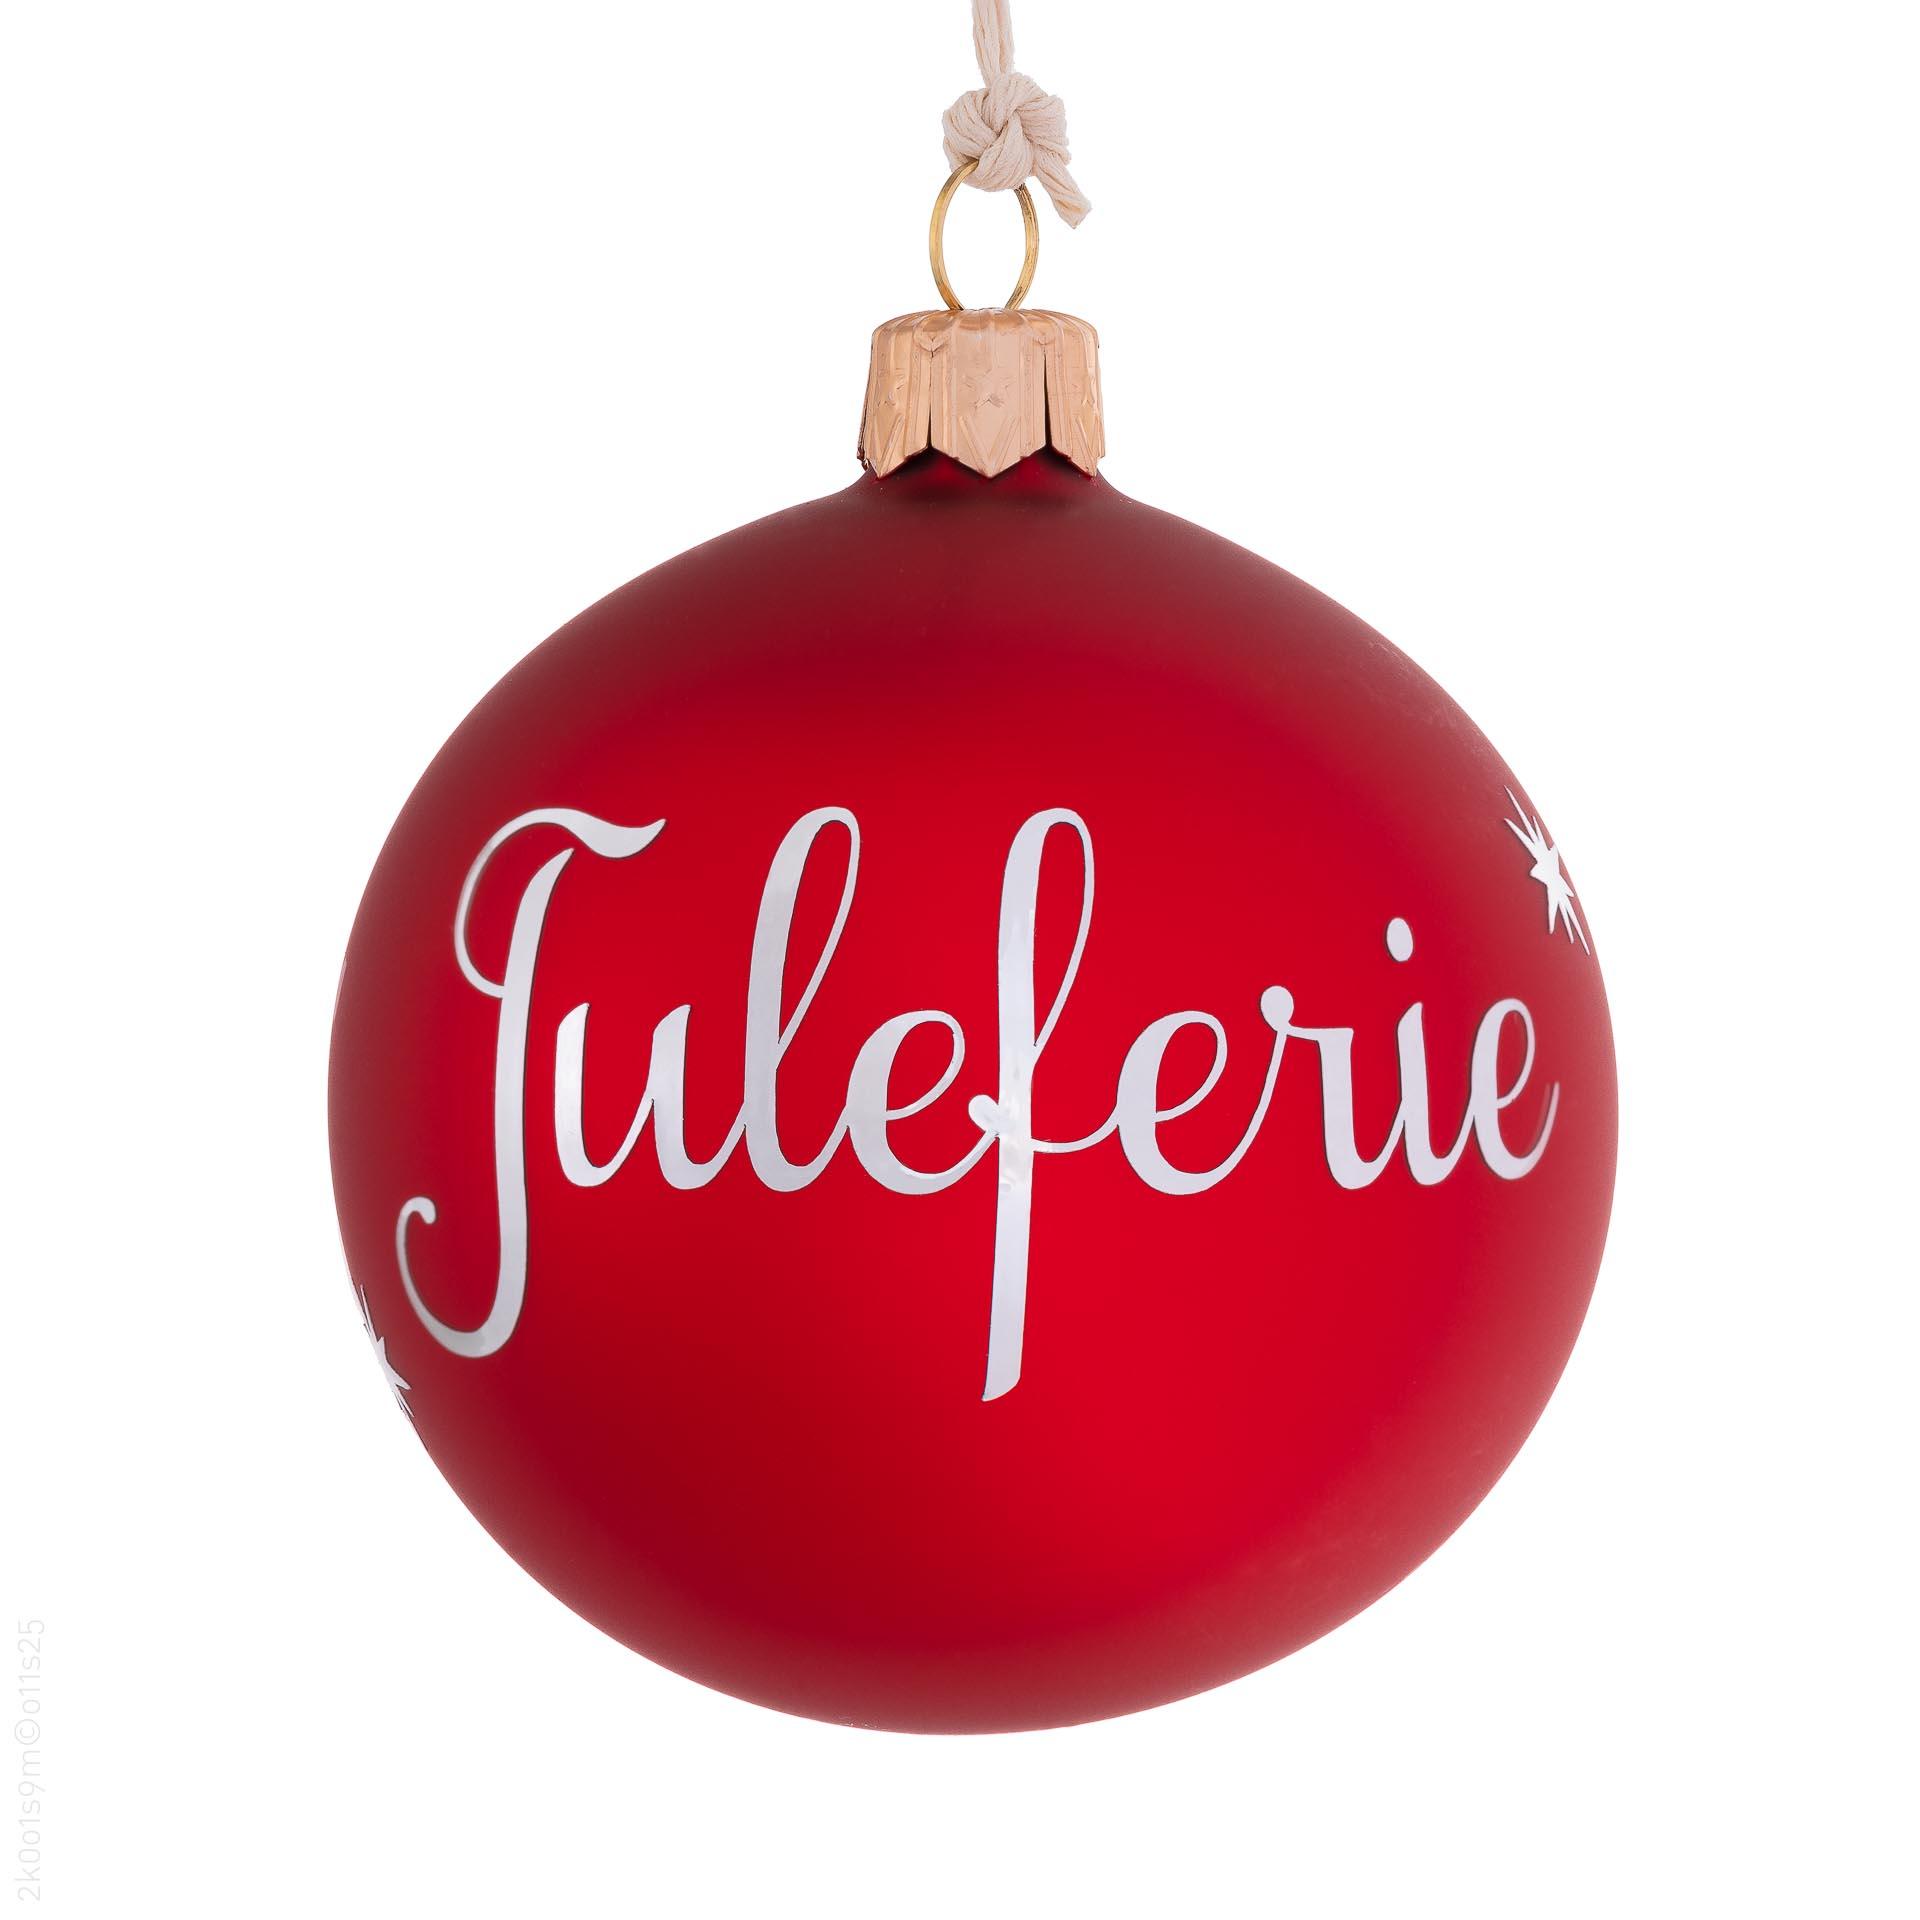 20191125-309854-CopyrightRobinLund-Juleferie-julekule